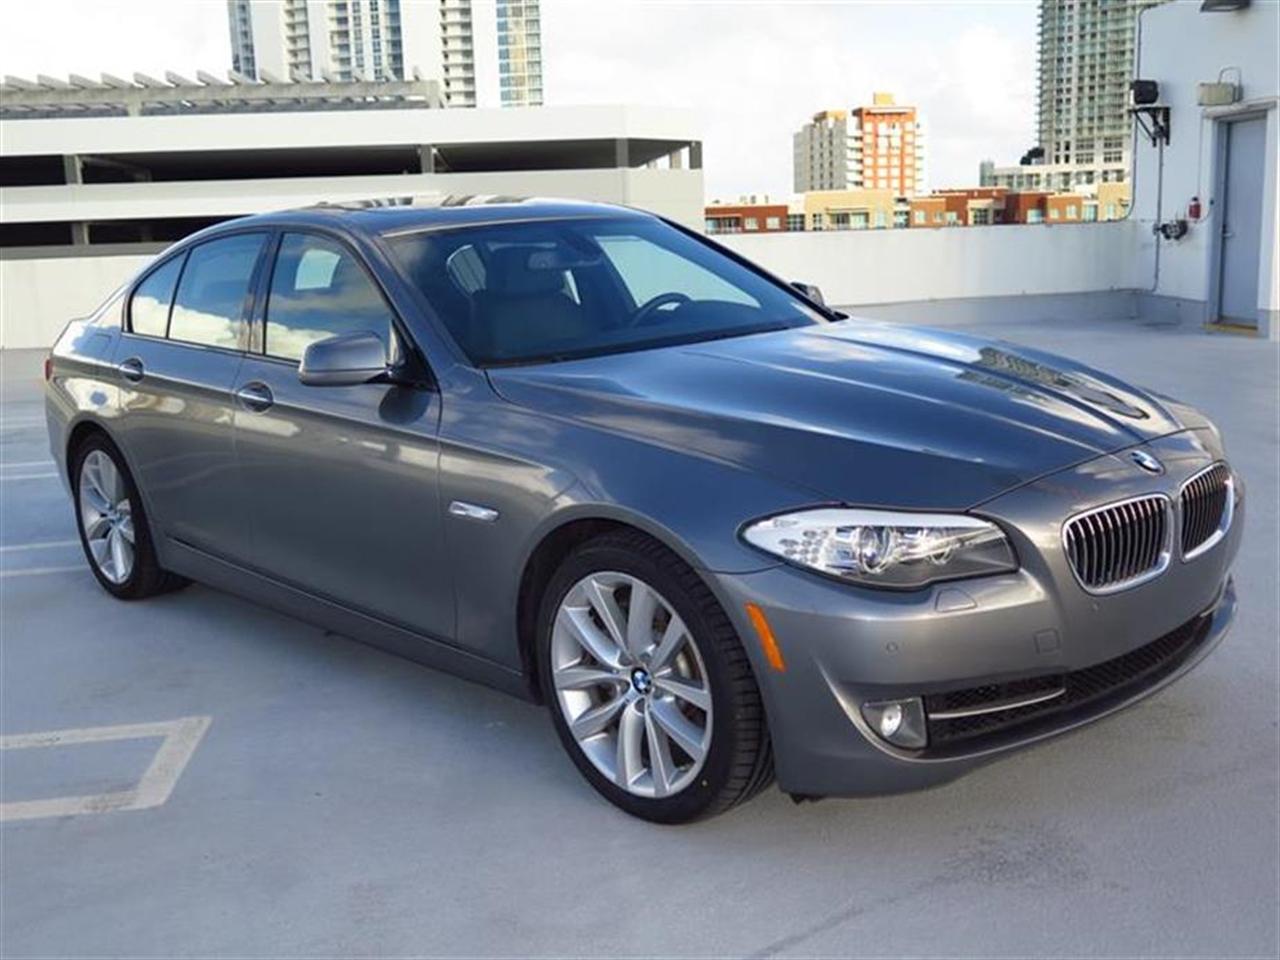 2012 BMW 5 SERIES 4dr Sdn 535i RWD 25693 miles 10-way power-adjustable front bucket seats -inc 4